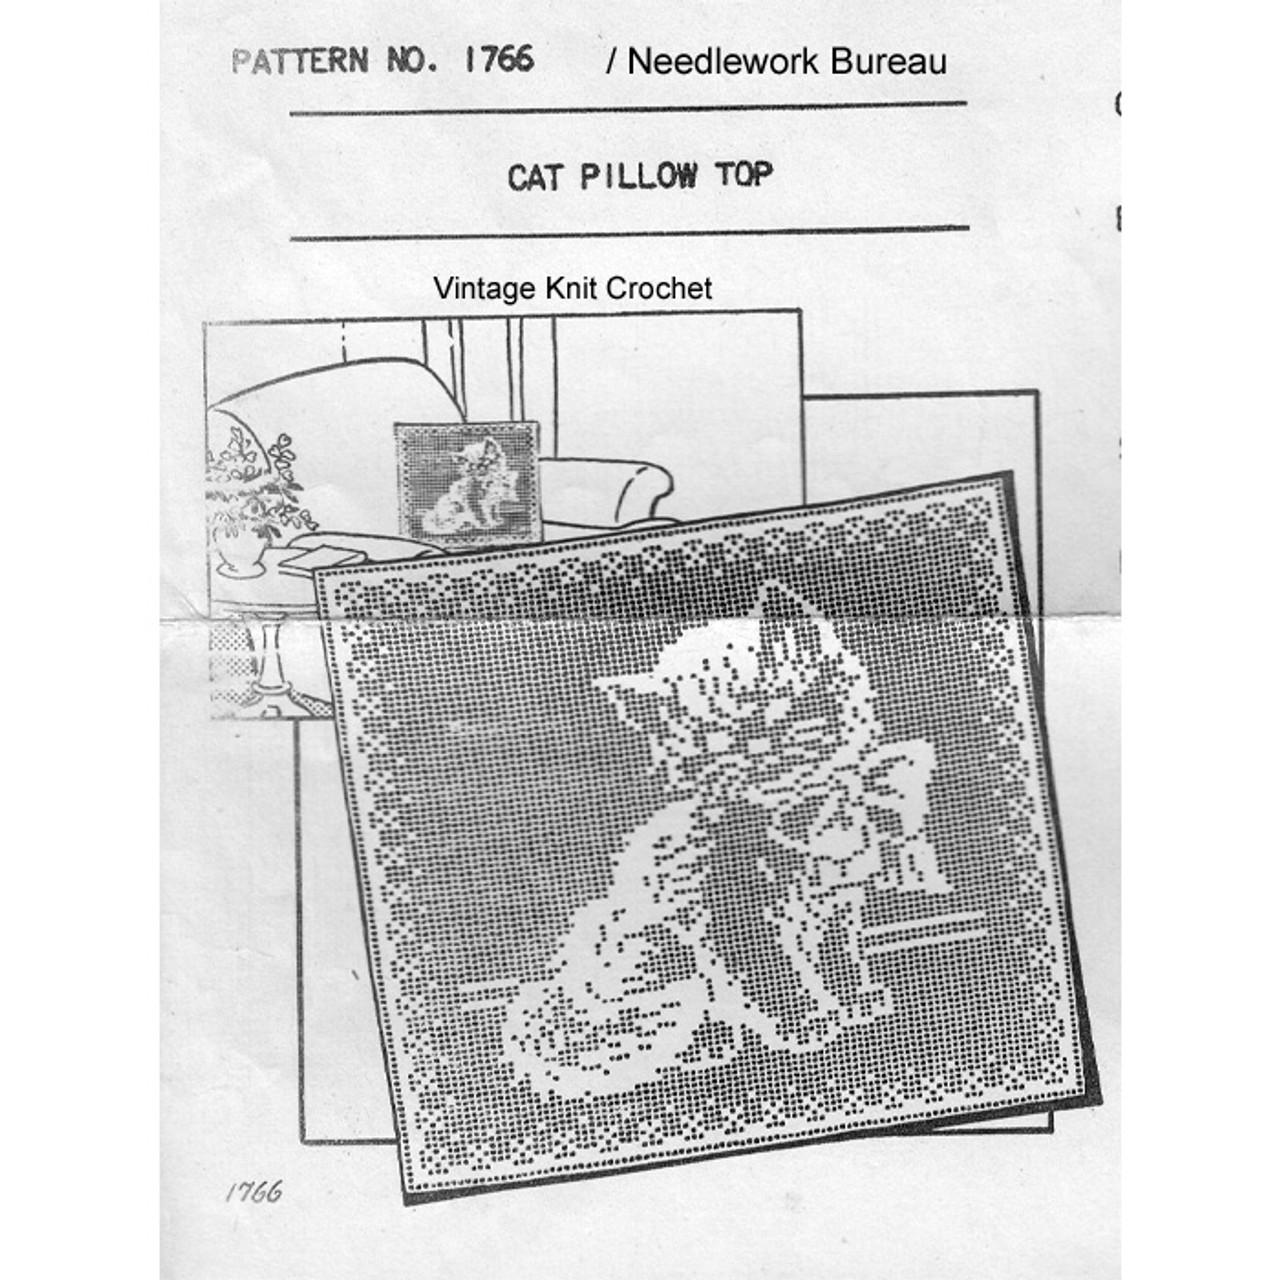 Kitten filet crochet square pillow pattern No 1766